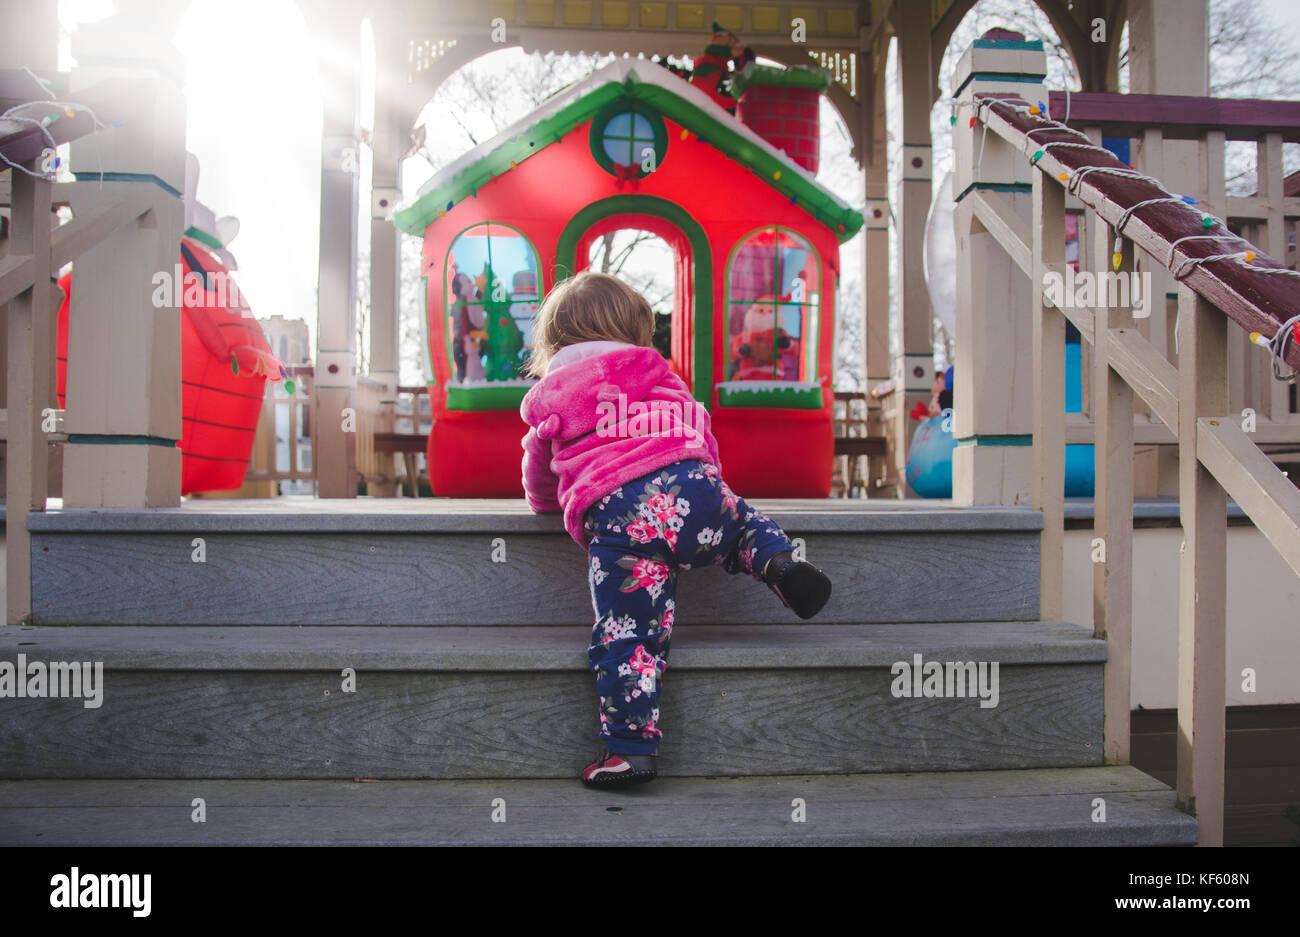 Toddler walking toward Christmas or holiday displays. - Stock Image